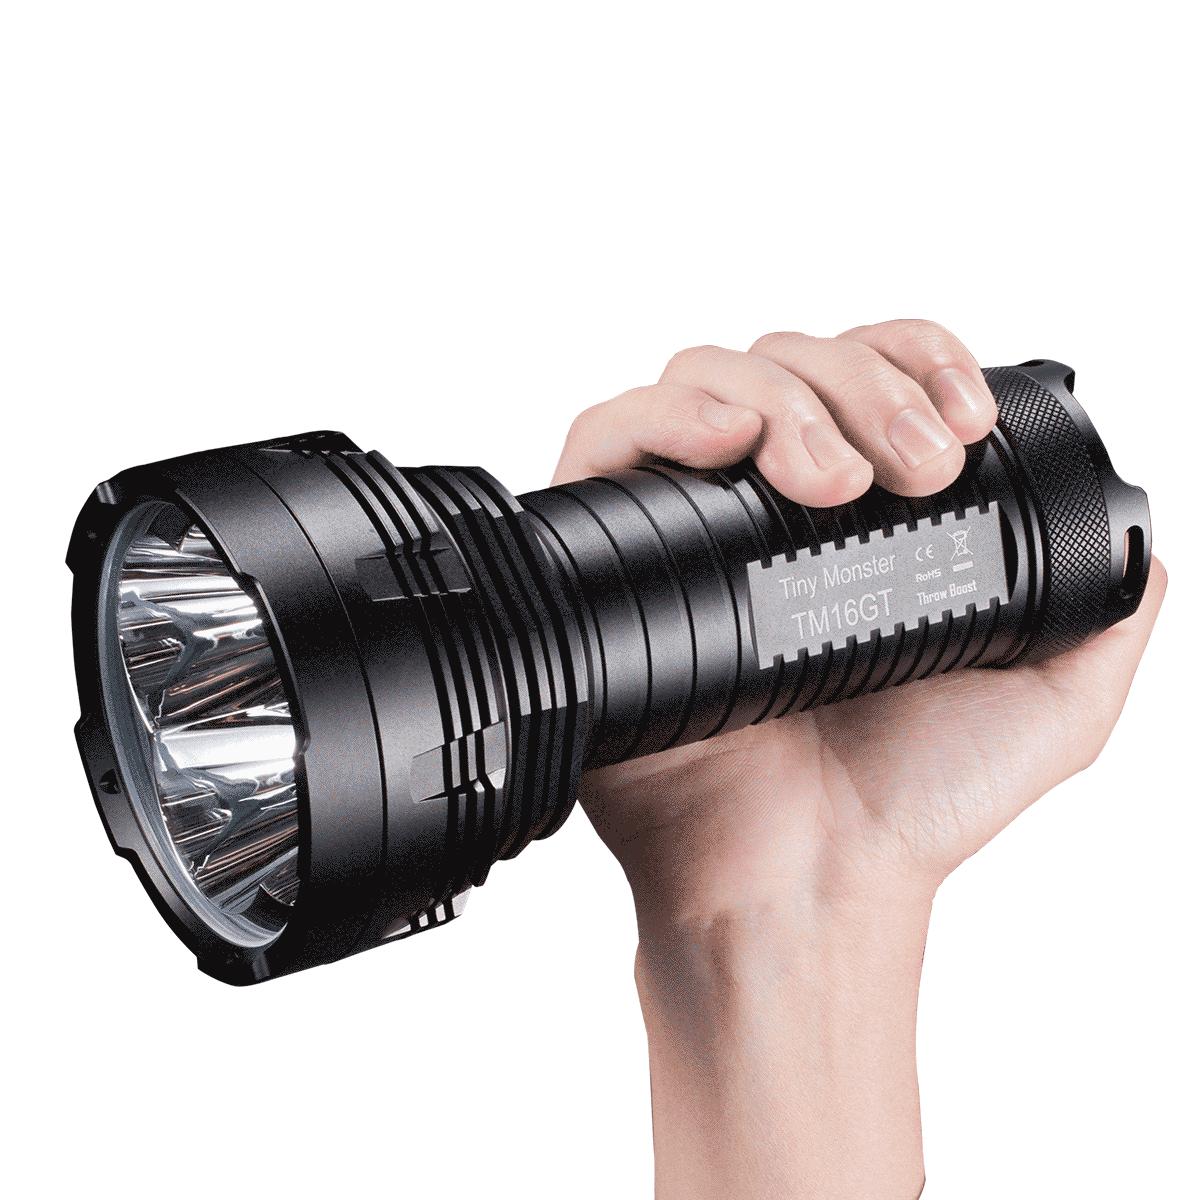 Nitecore TM16 4000 Lumen XM-L2 Handheld Search Flashlight Ultra Long Range 700m